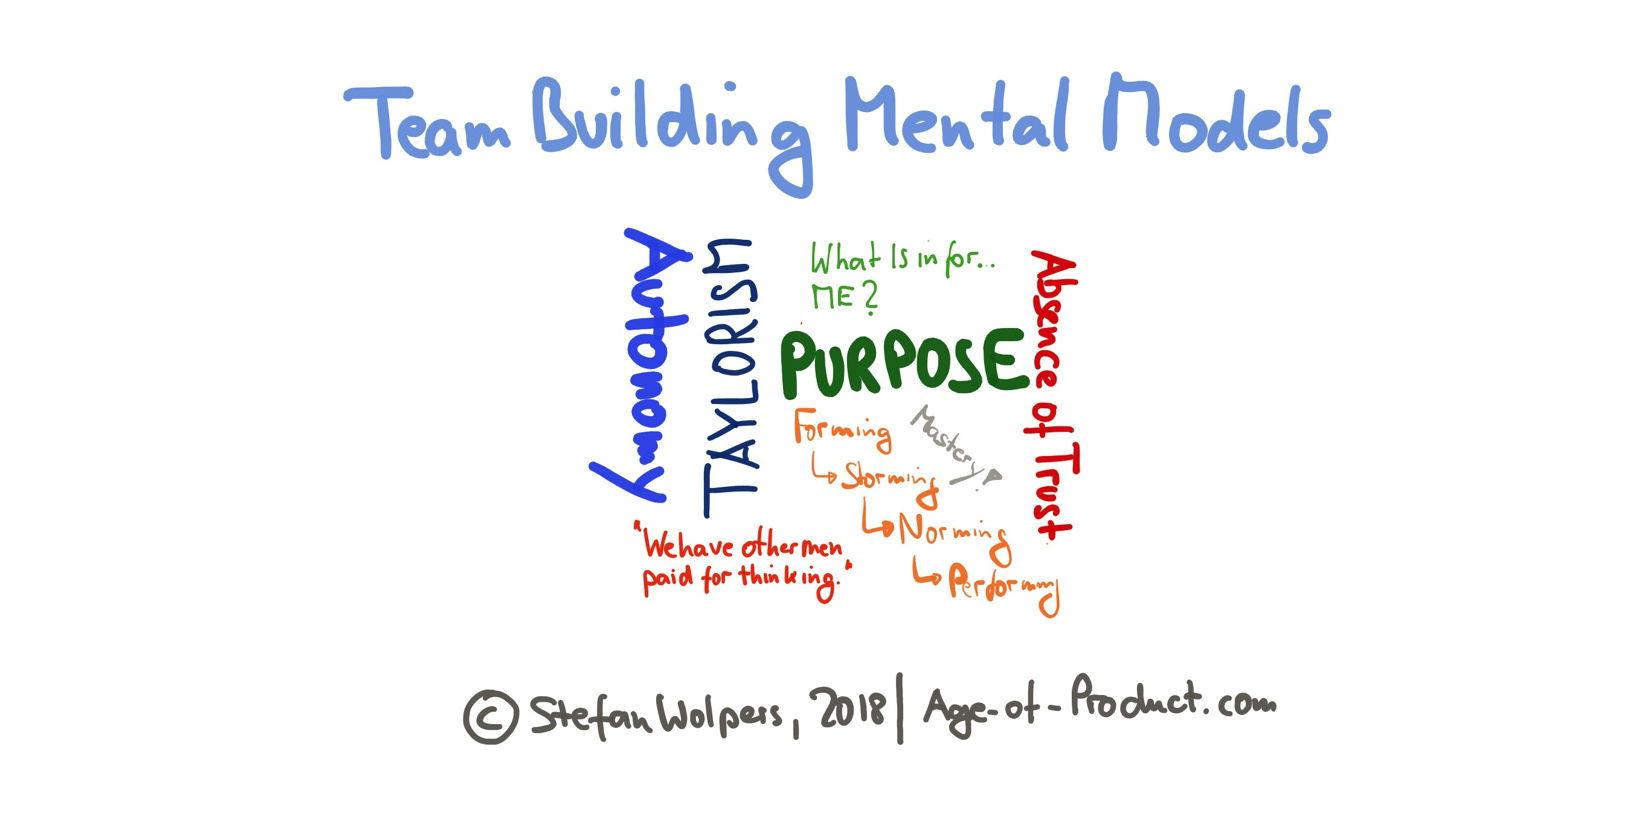 Team Building Mental Models